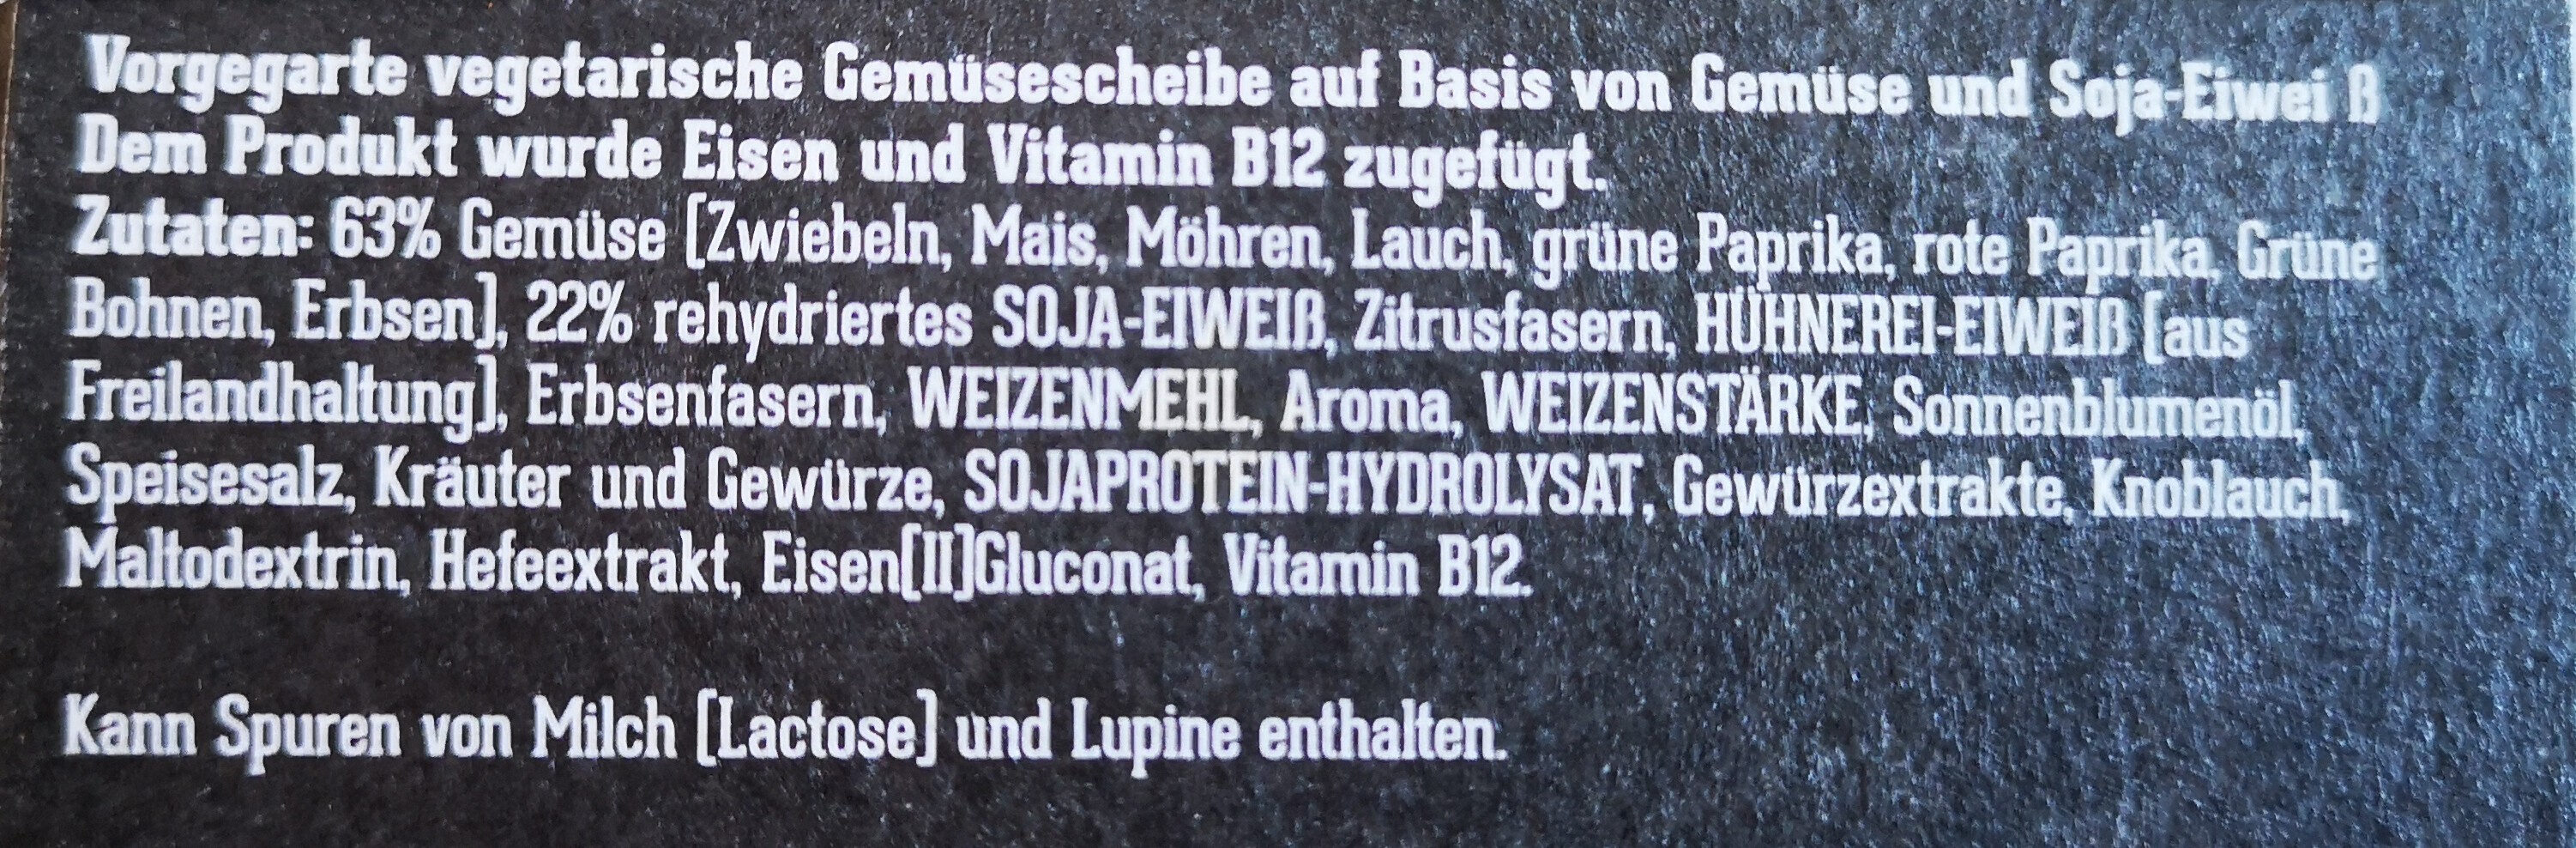 Vega Vegetarisch Gemüsescheibe - Ingredients